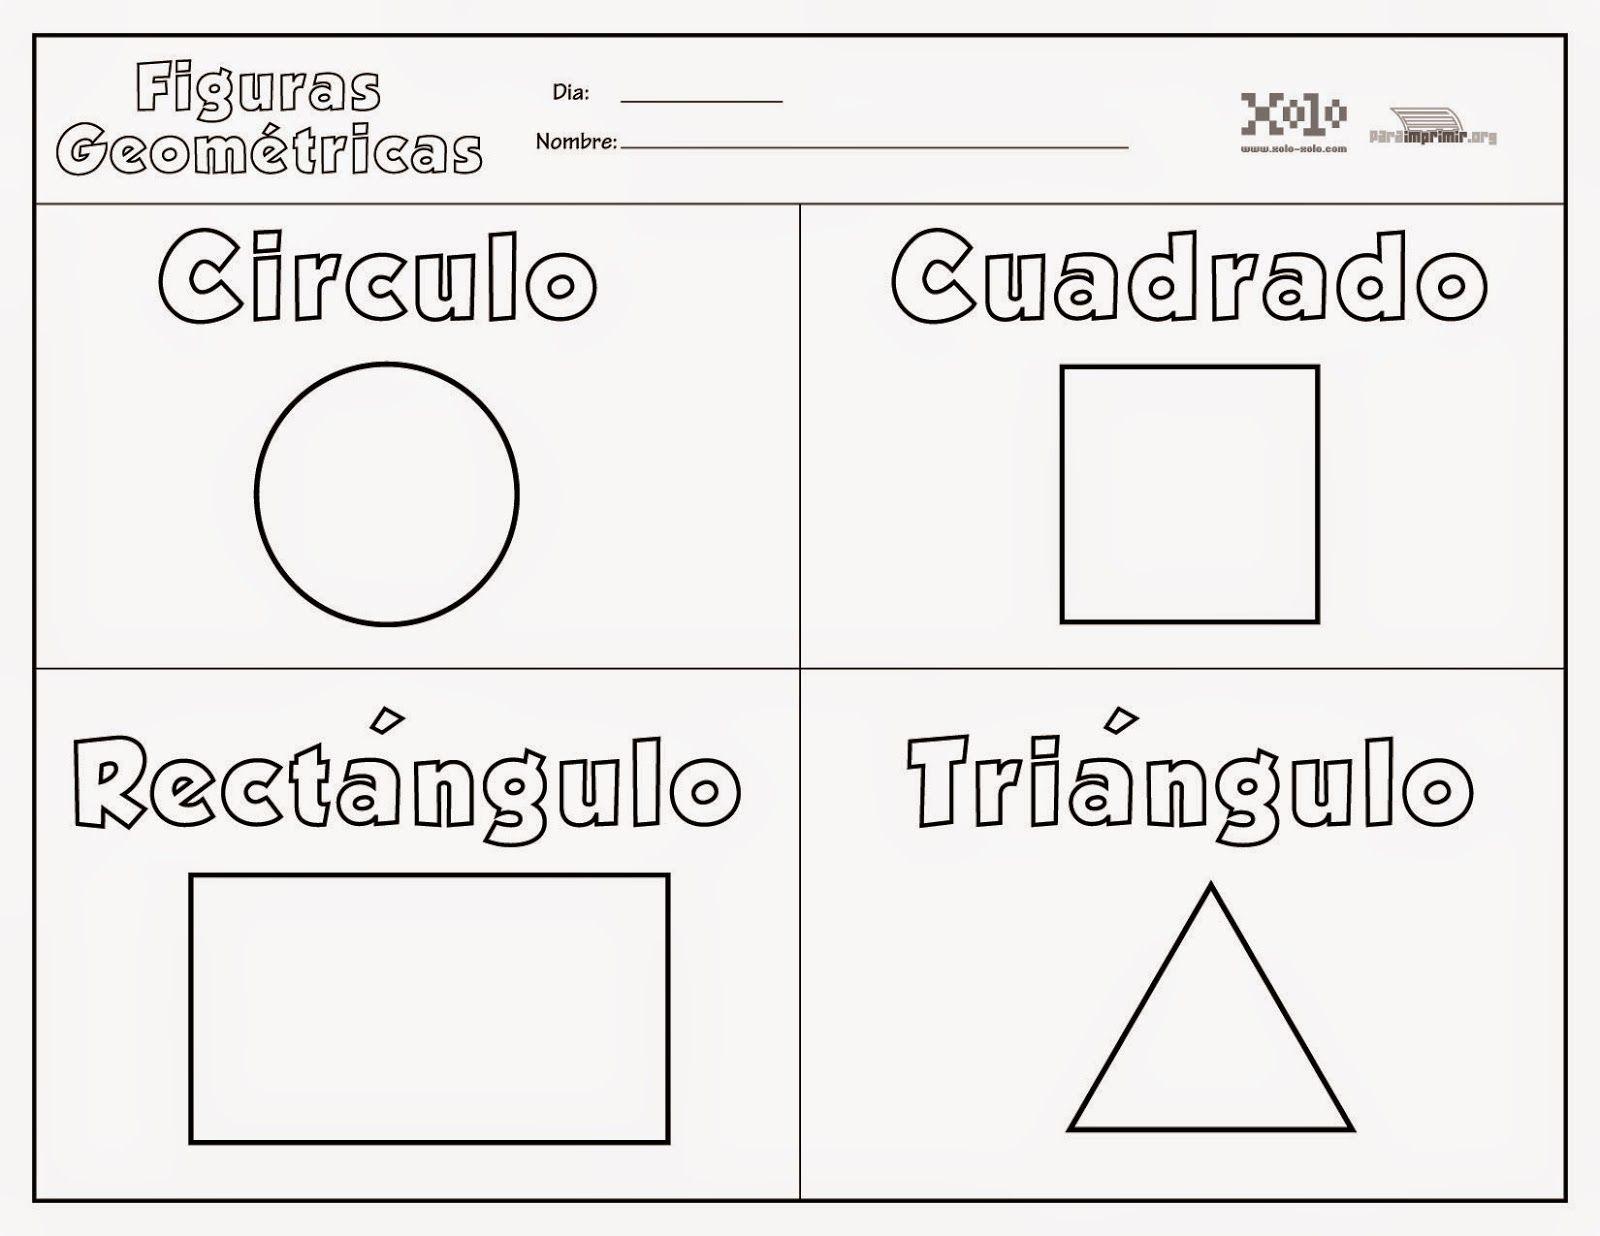 Educación Infantil con TIC: Figuras geométricas | word | Pinterest